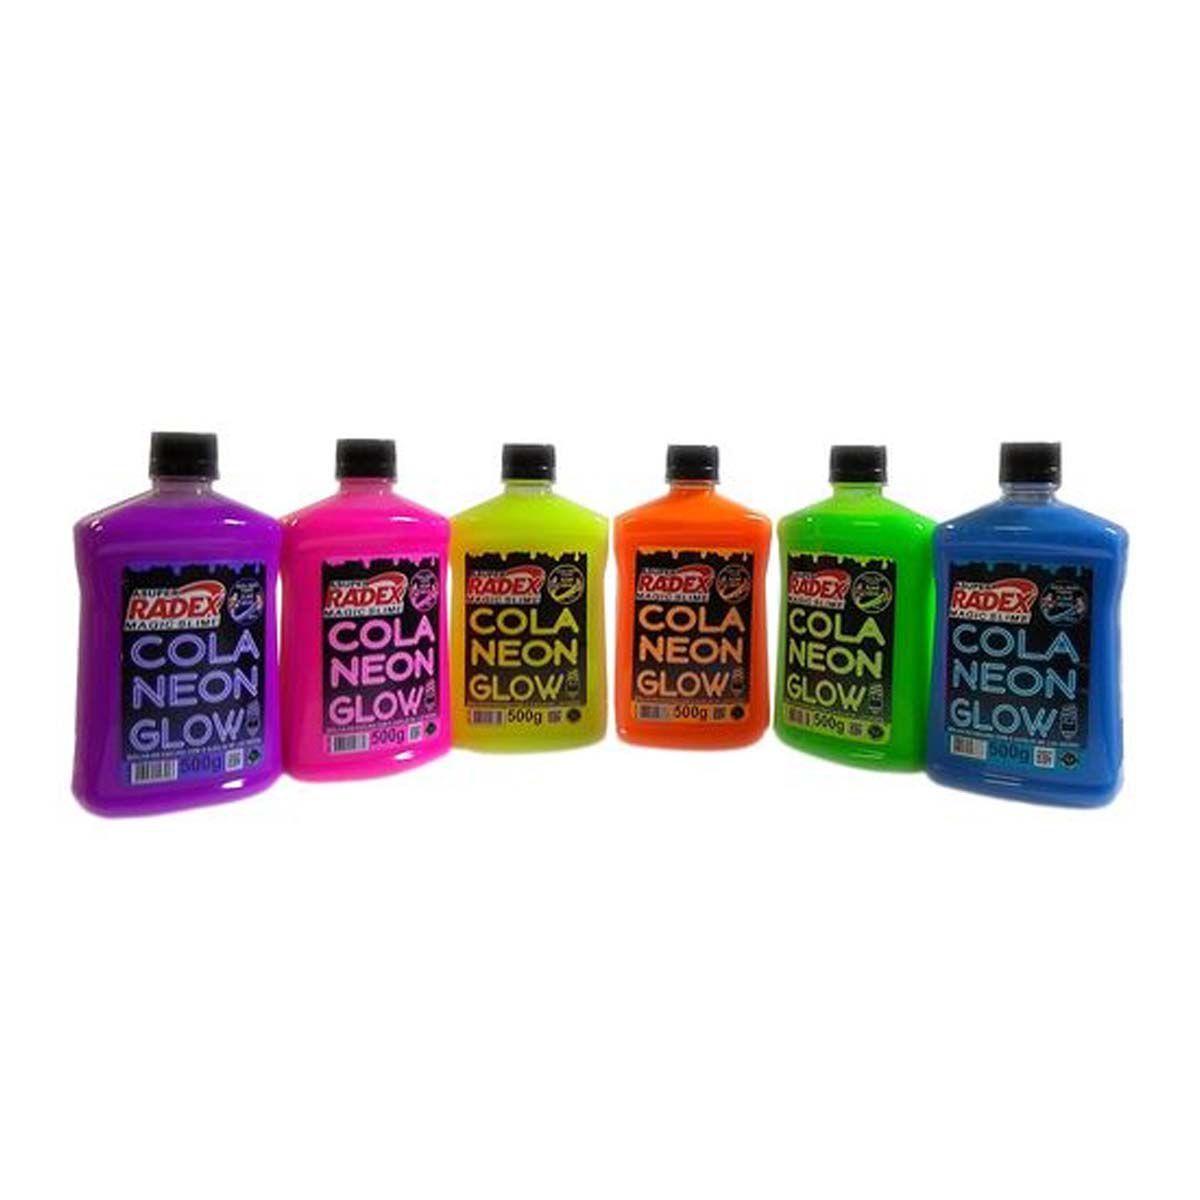 Cola Radex Neon Glow p/ Slime 500g  - Papel Pautado